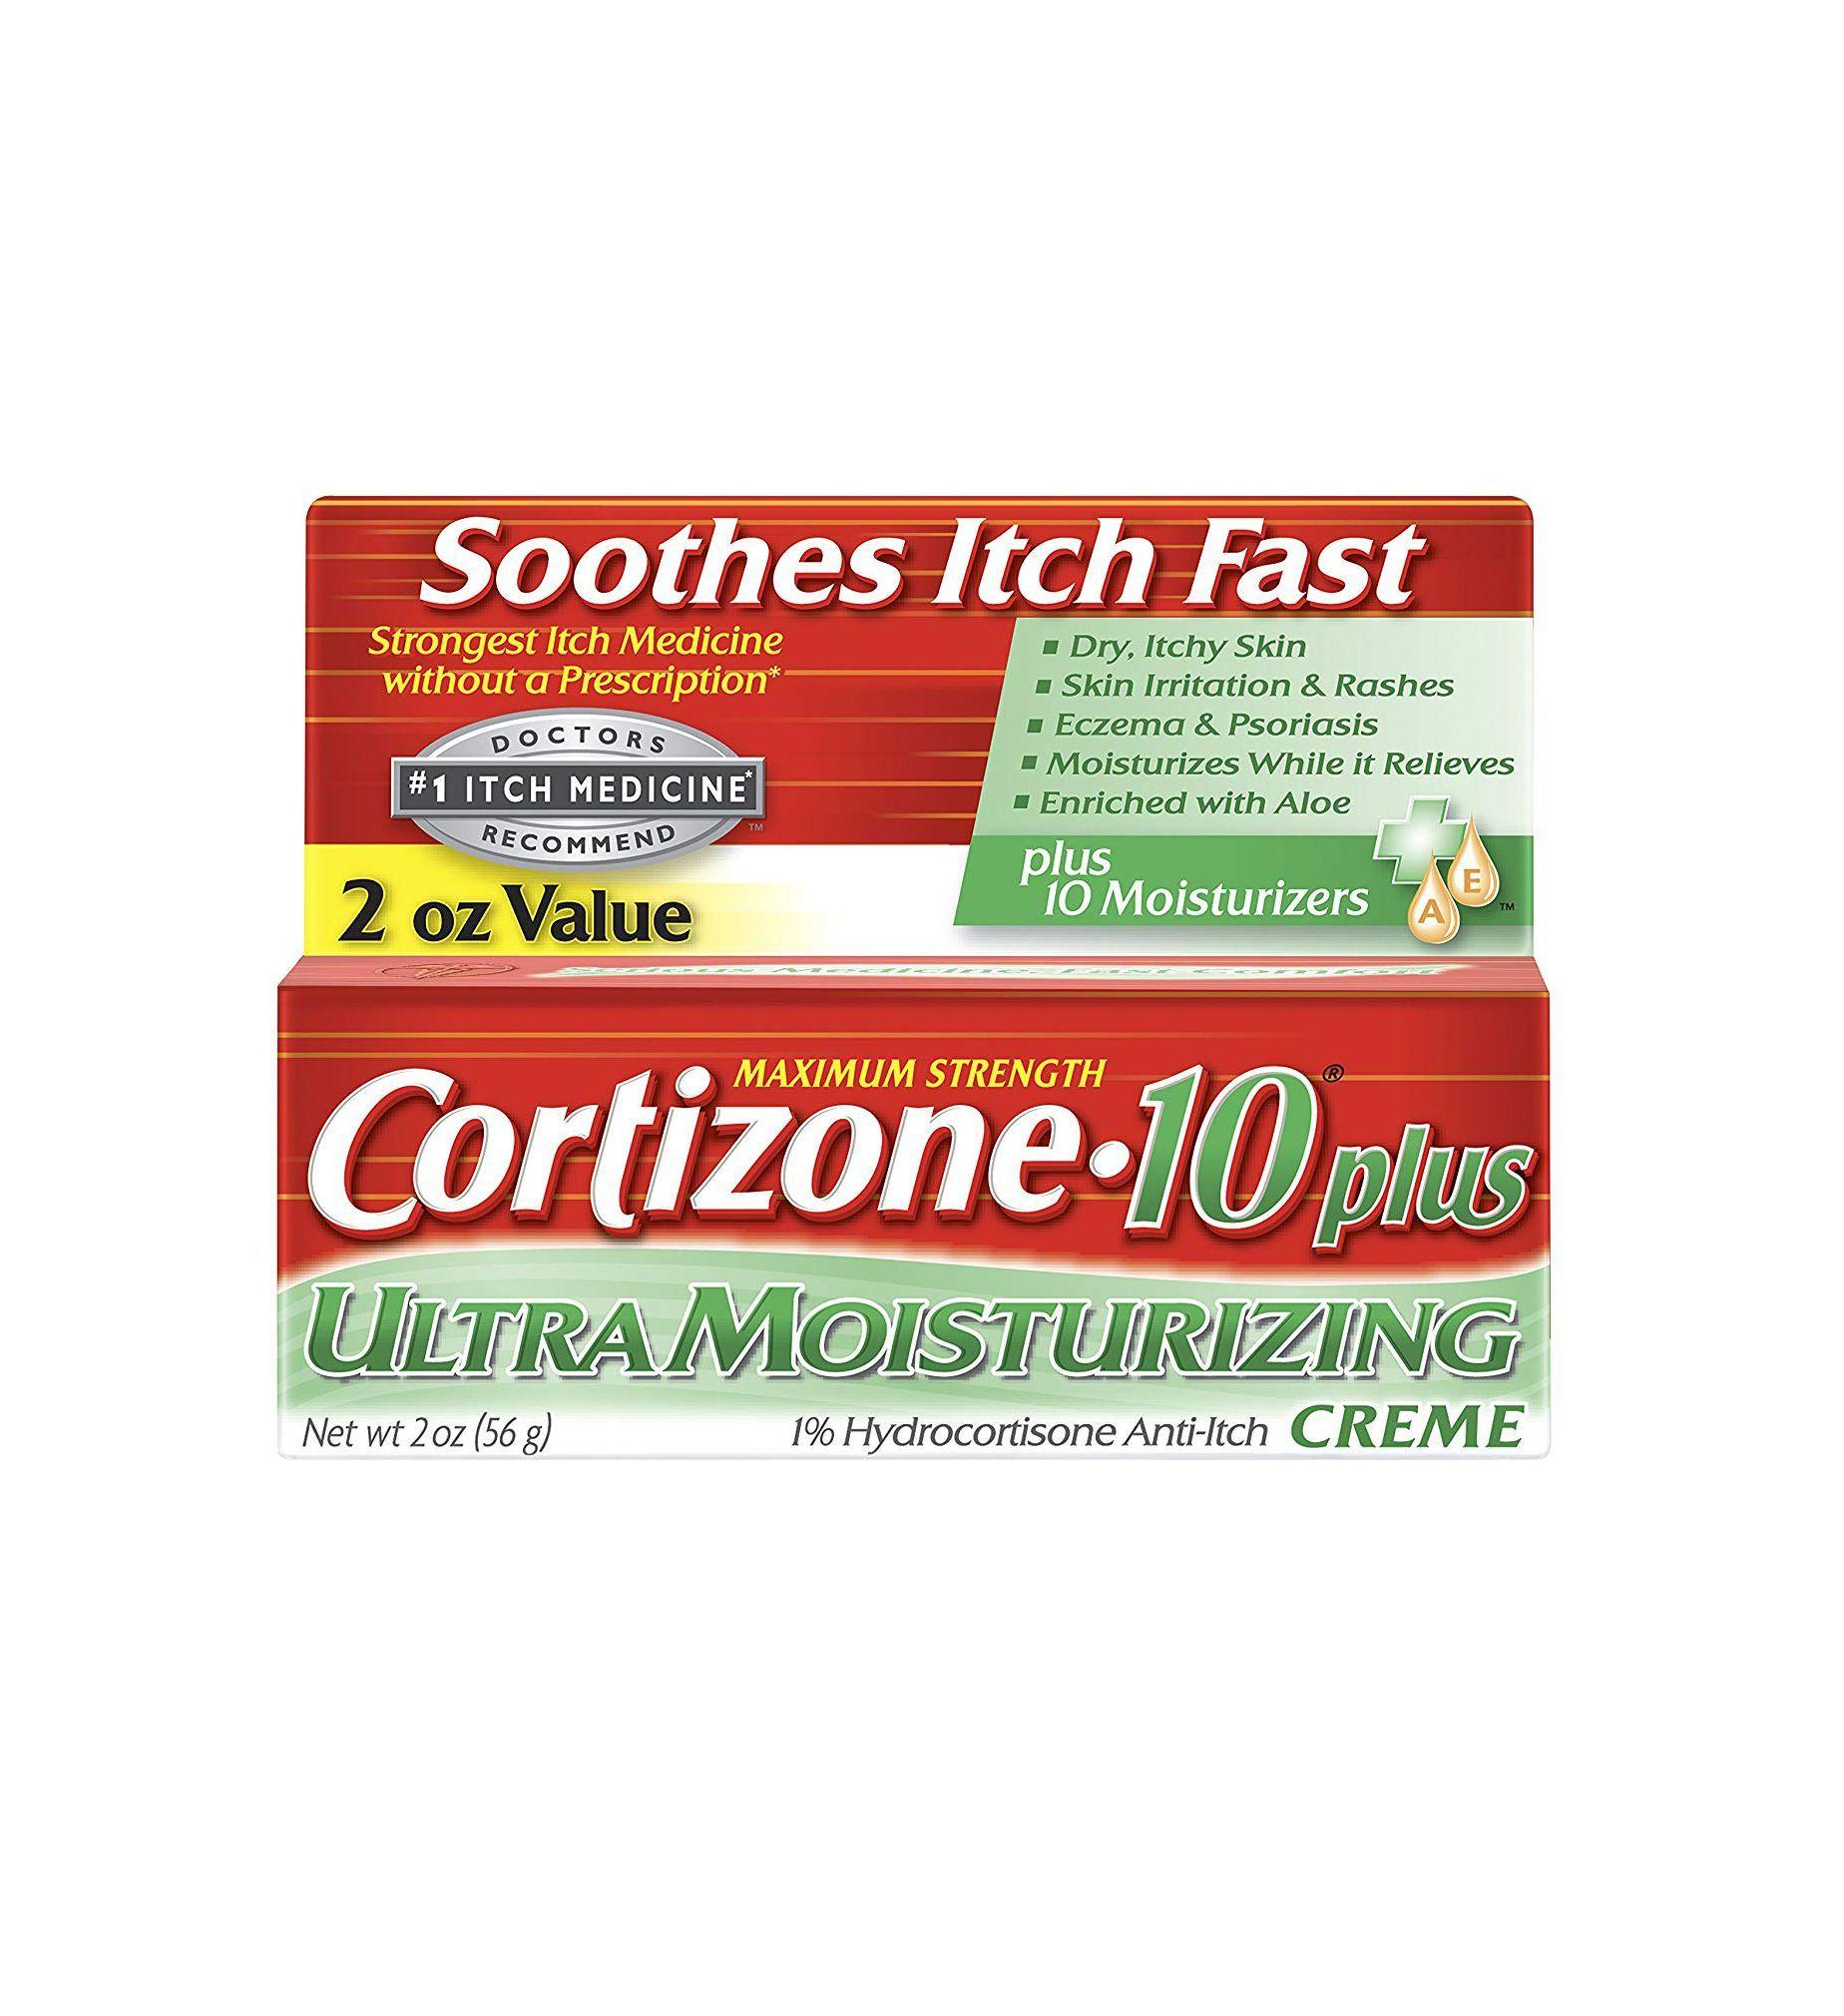 Cortizone-10 Plus Ultra Moisturizing Hydrocortisone Anti-Itch Creme